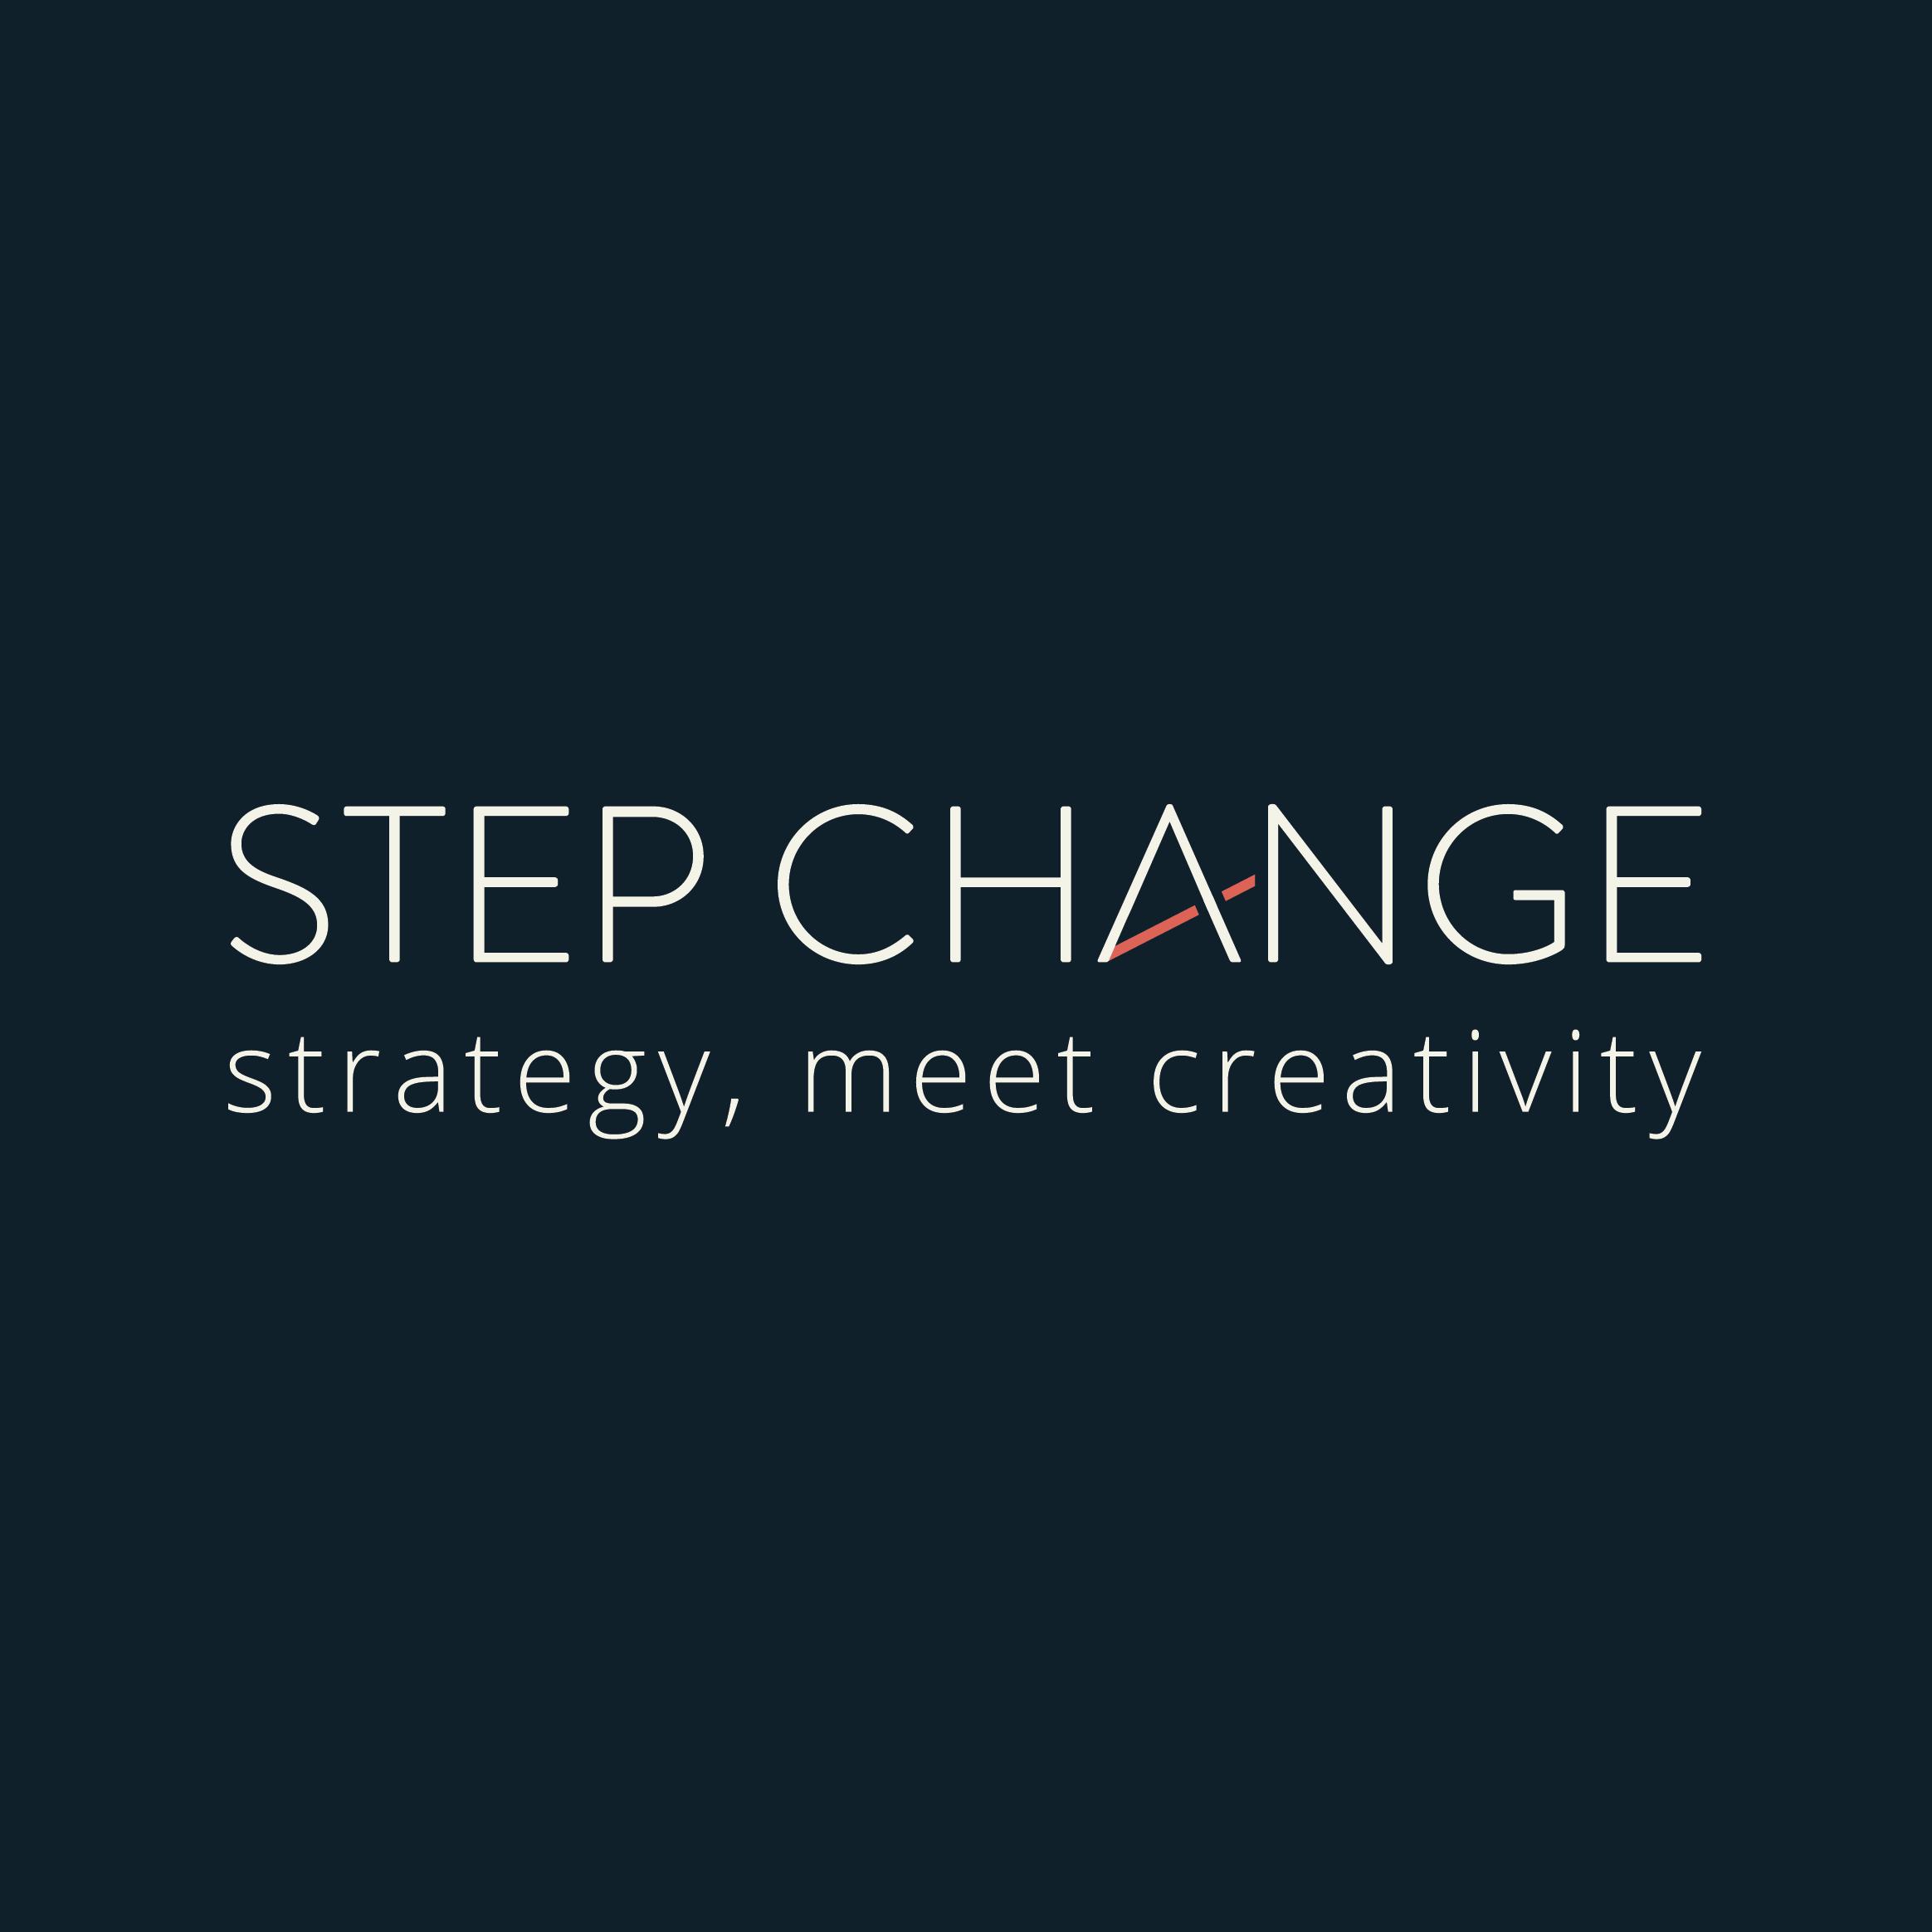 Step Change